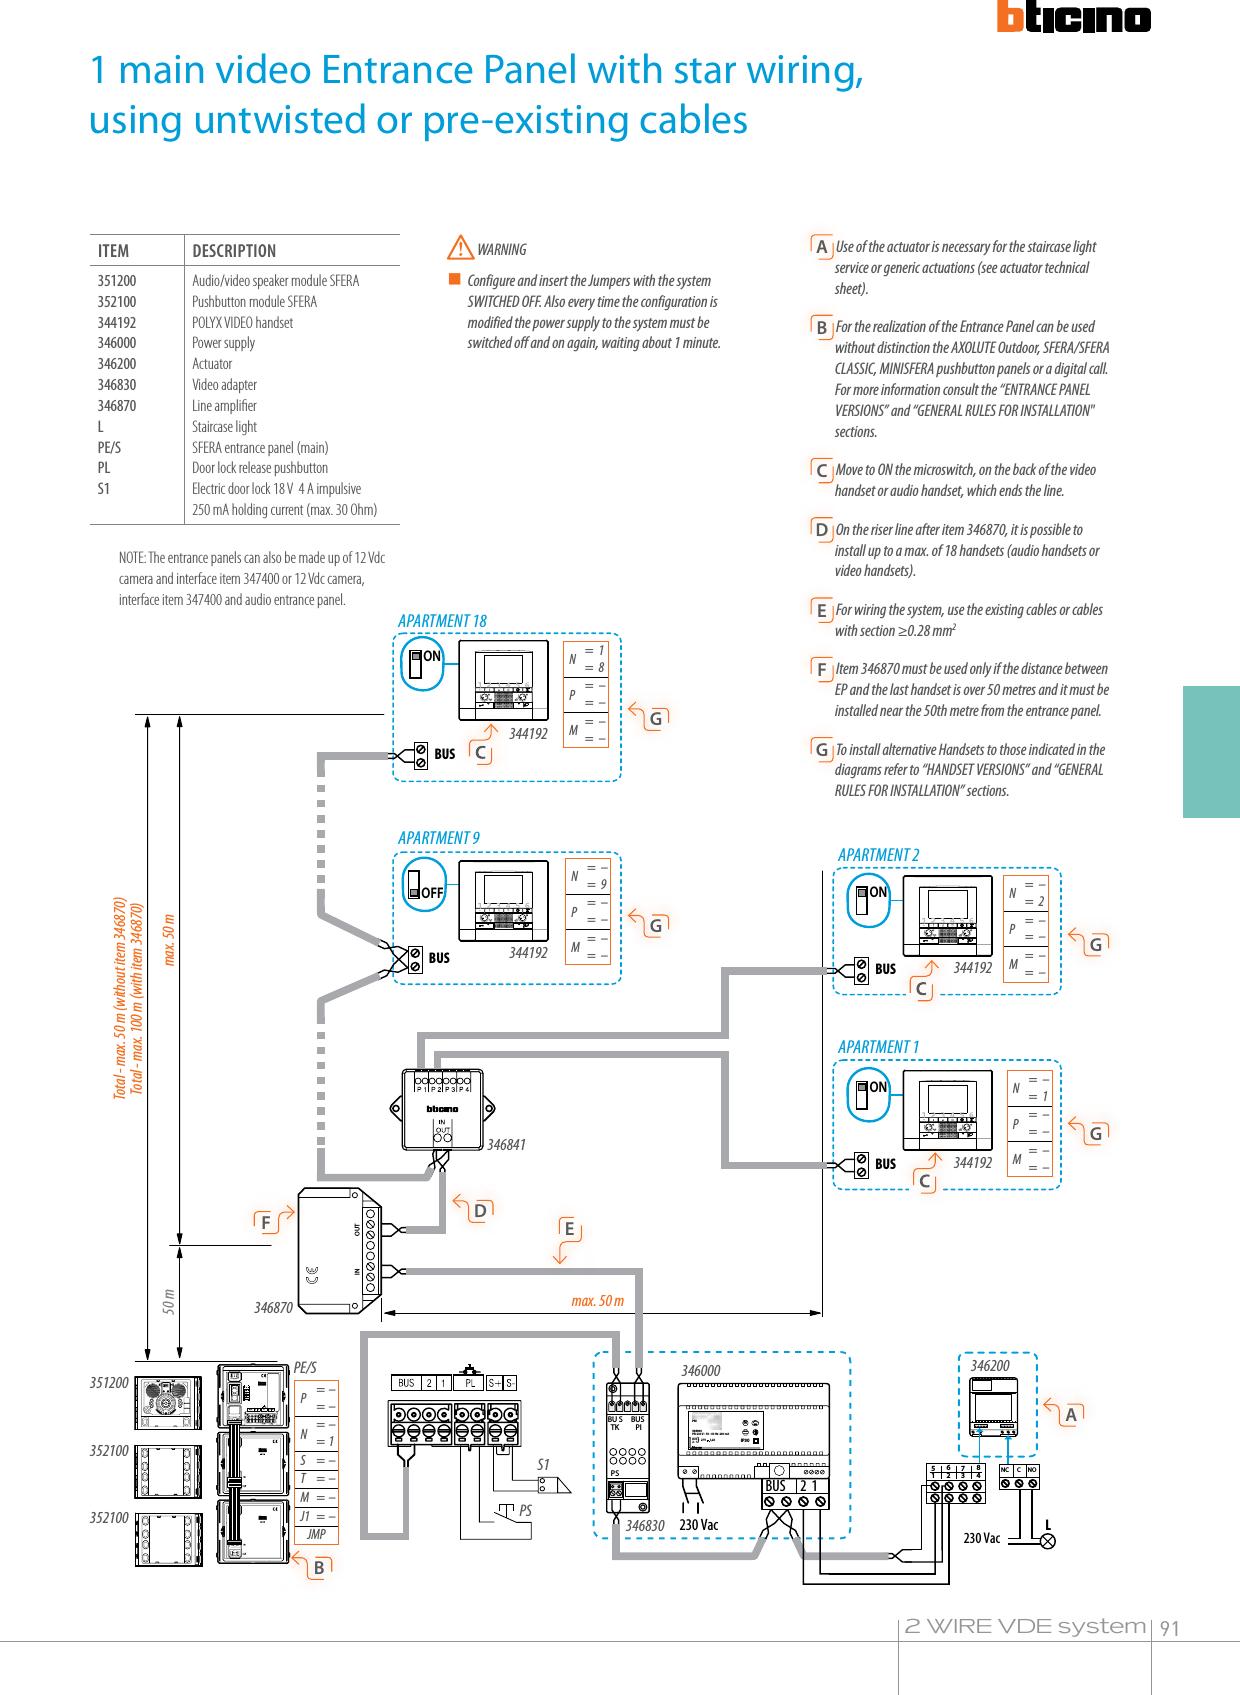 230 Vac Wiring   Wiring Liry Ranger V B Boat Wiring Diagram on